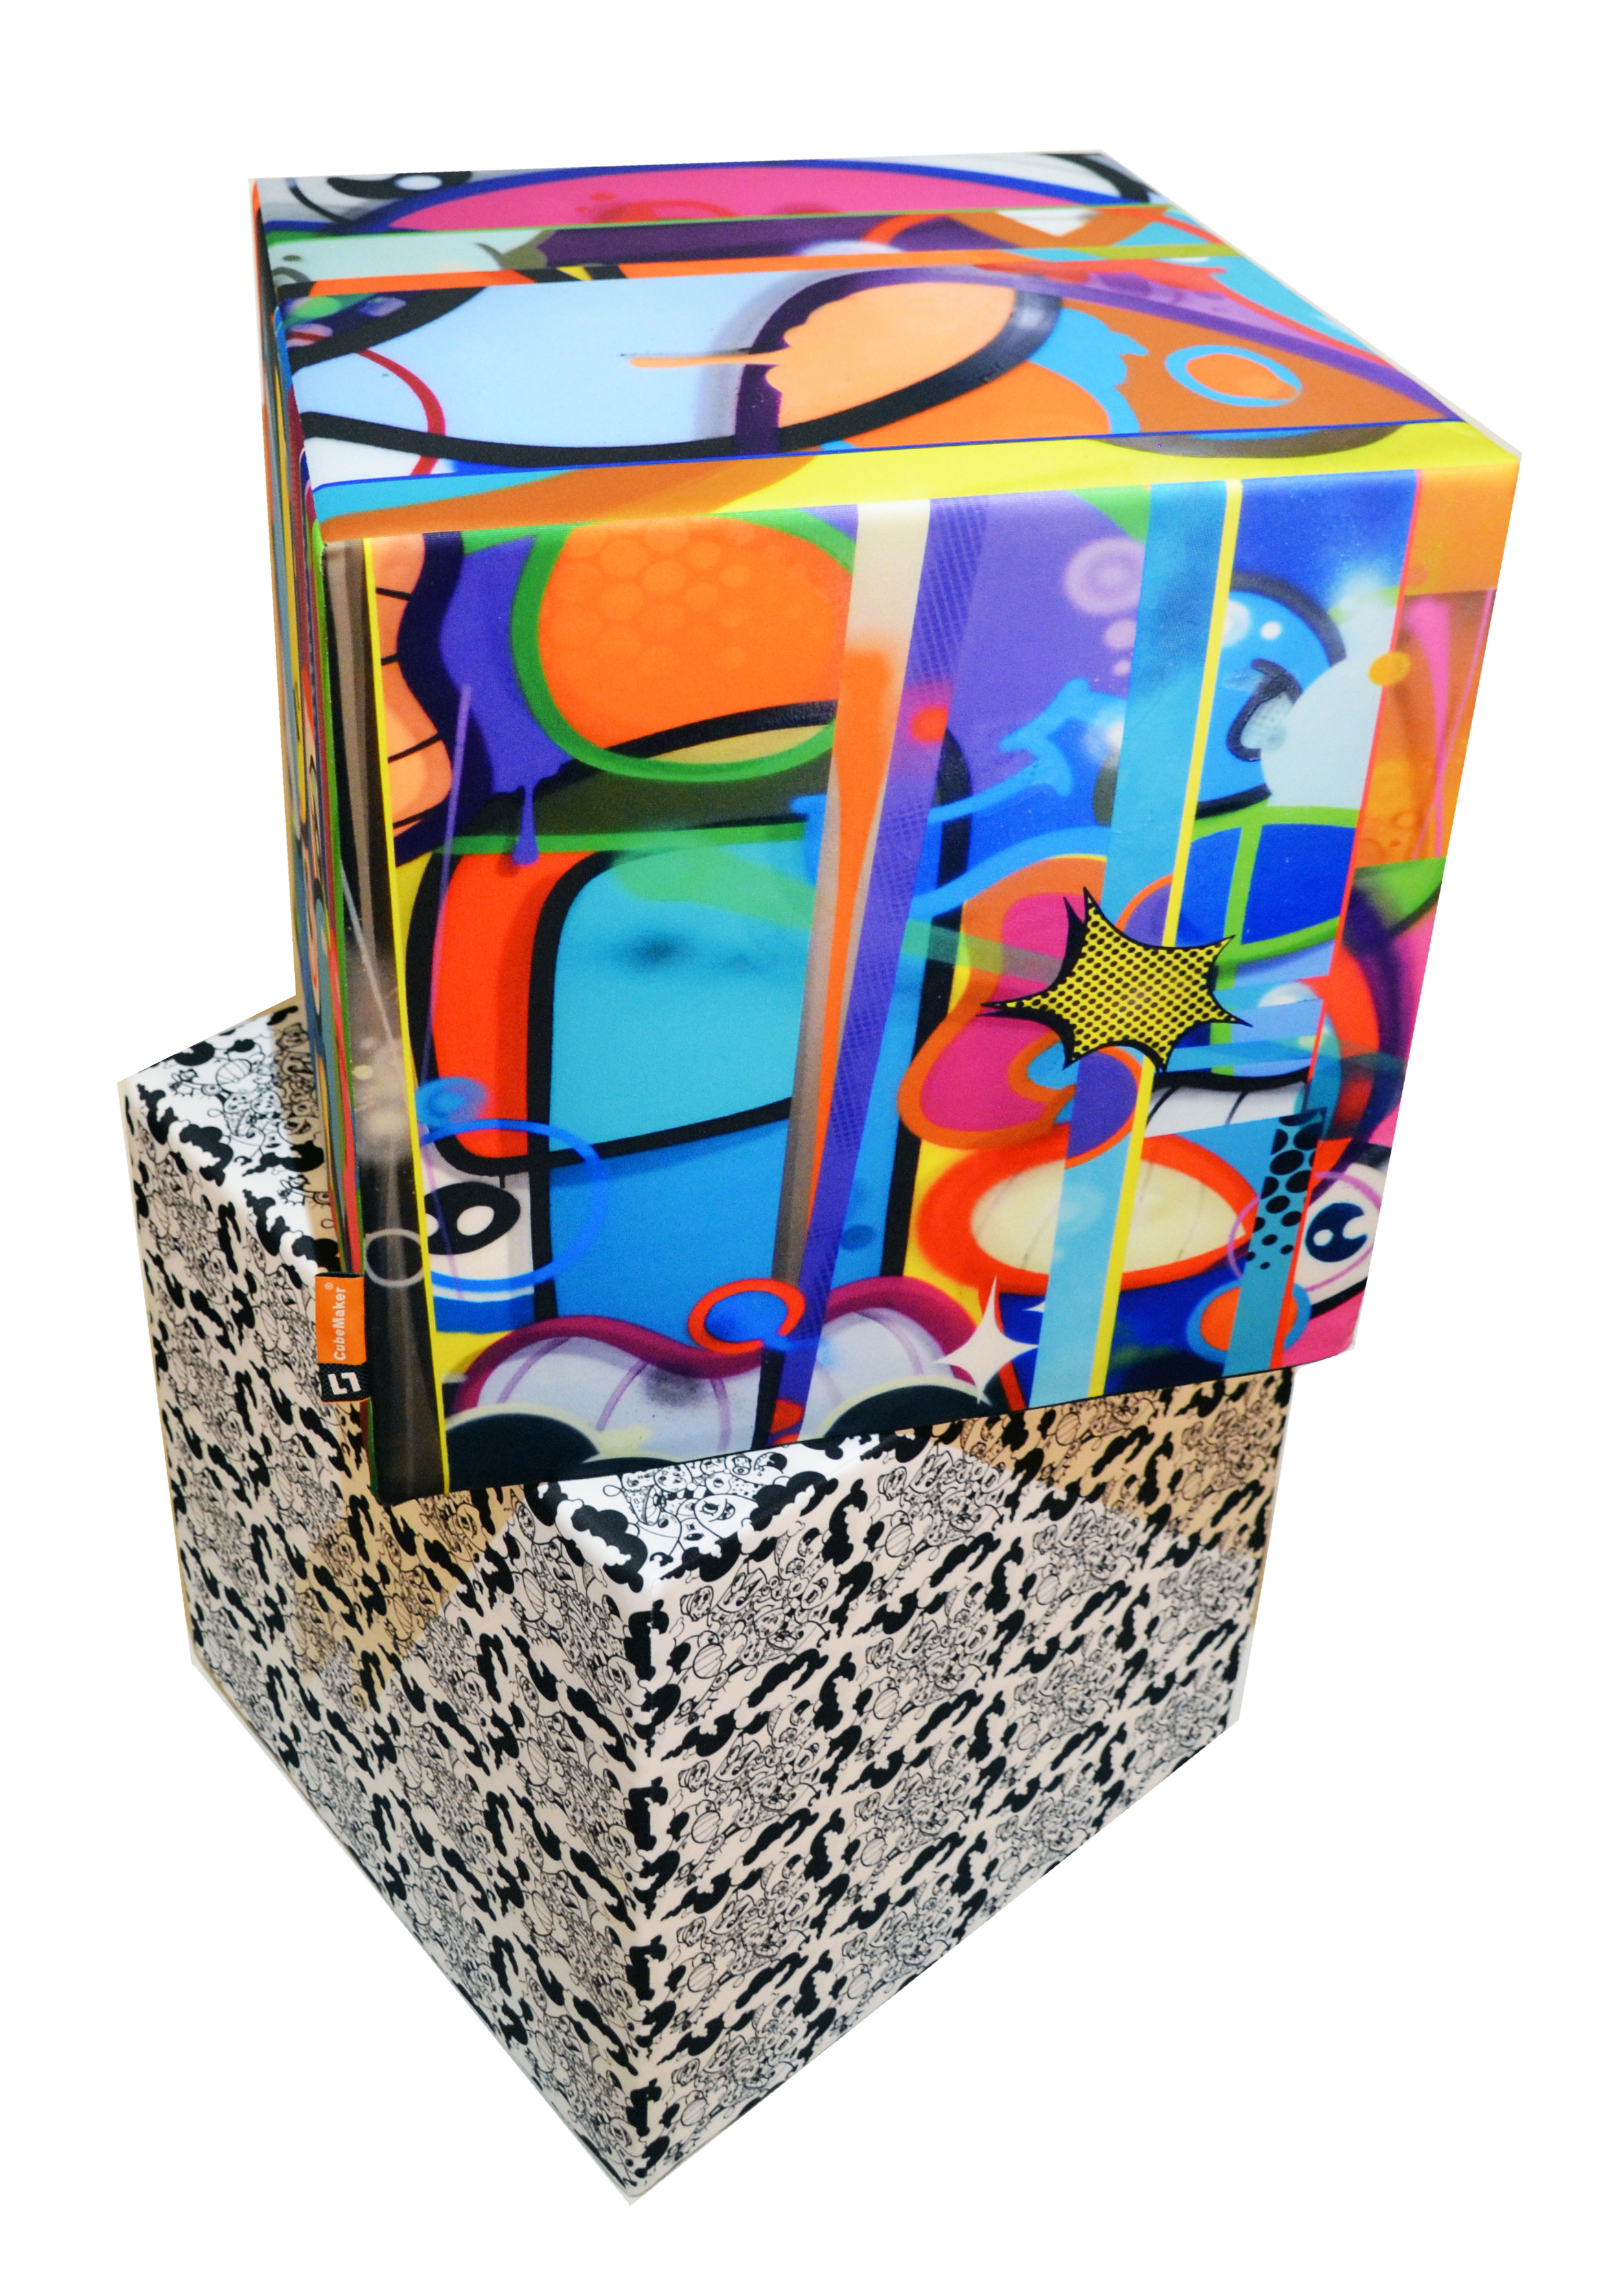 design cubes 3x45cm cubemaker leipzig